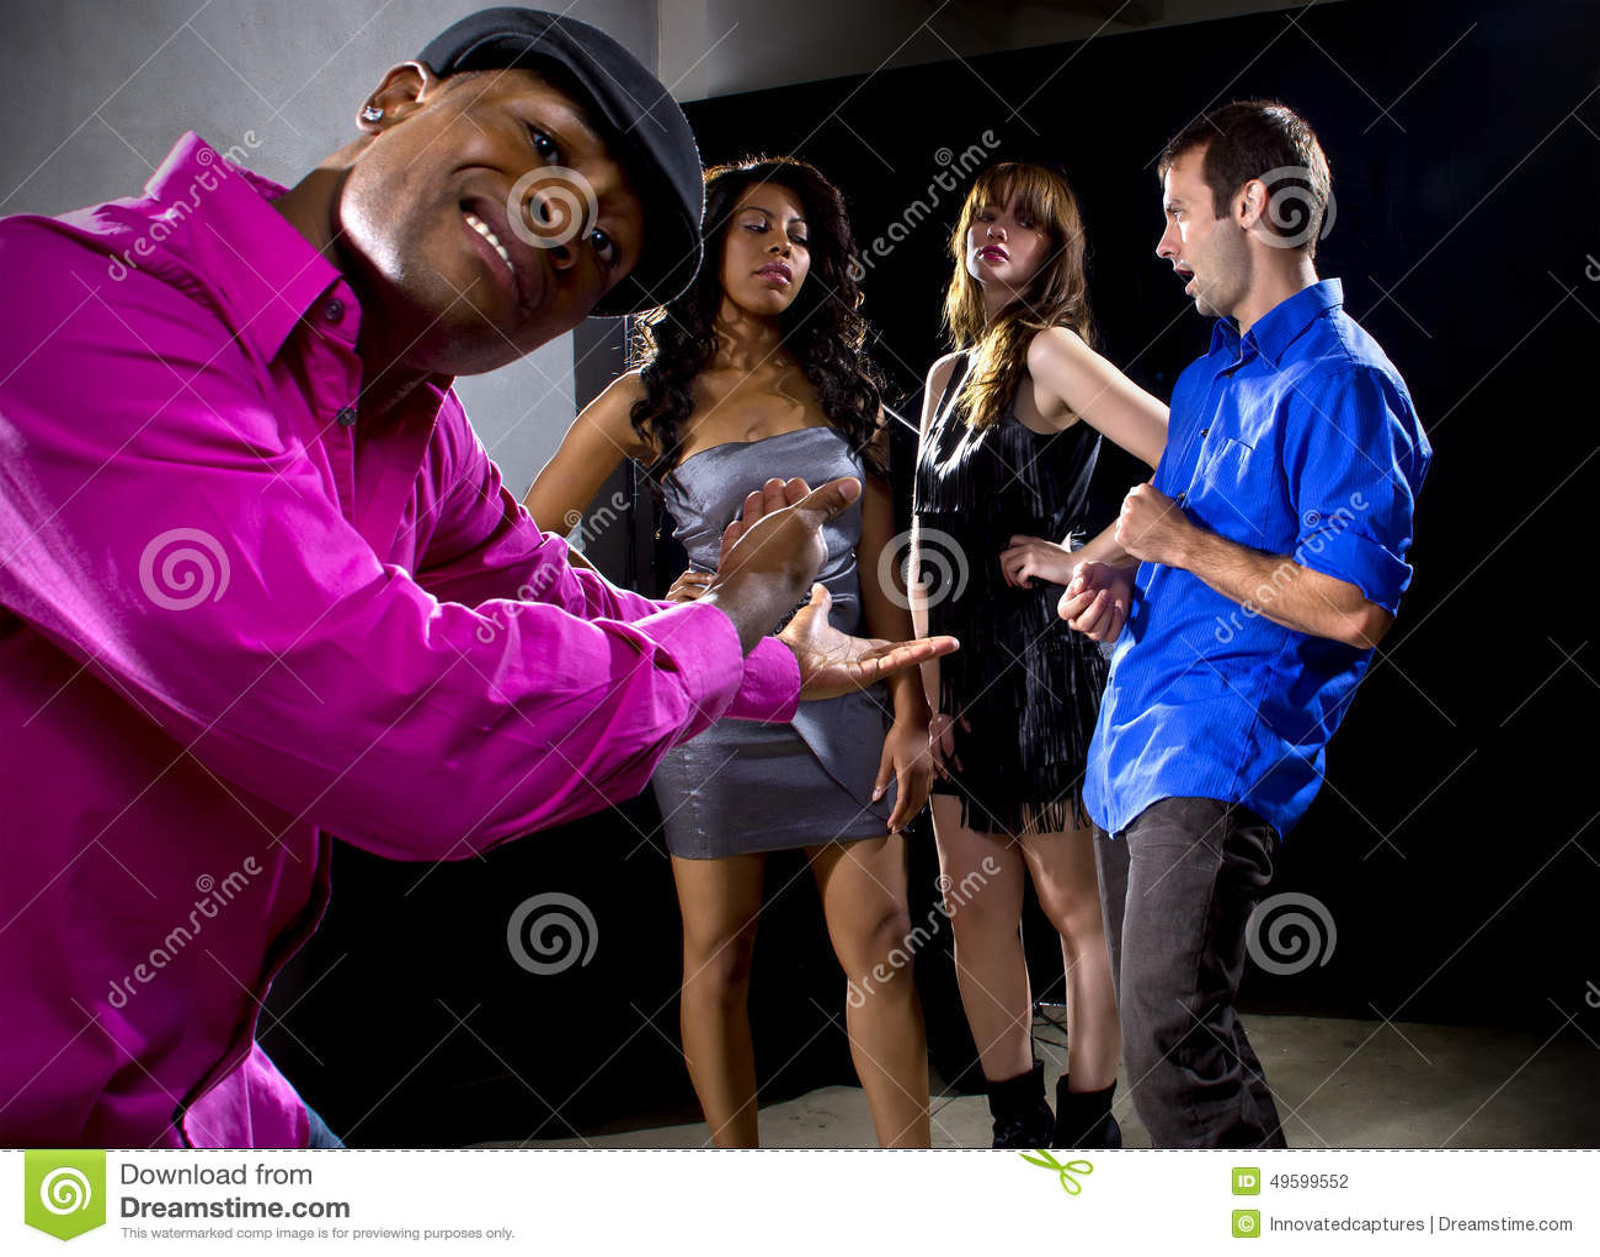 [Image: getting-rejected-girls-nightclub-laughin...599552.jpg]